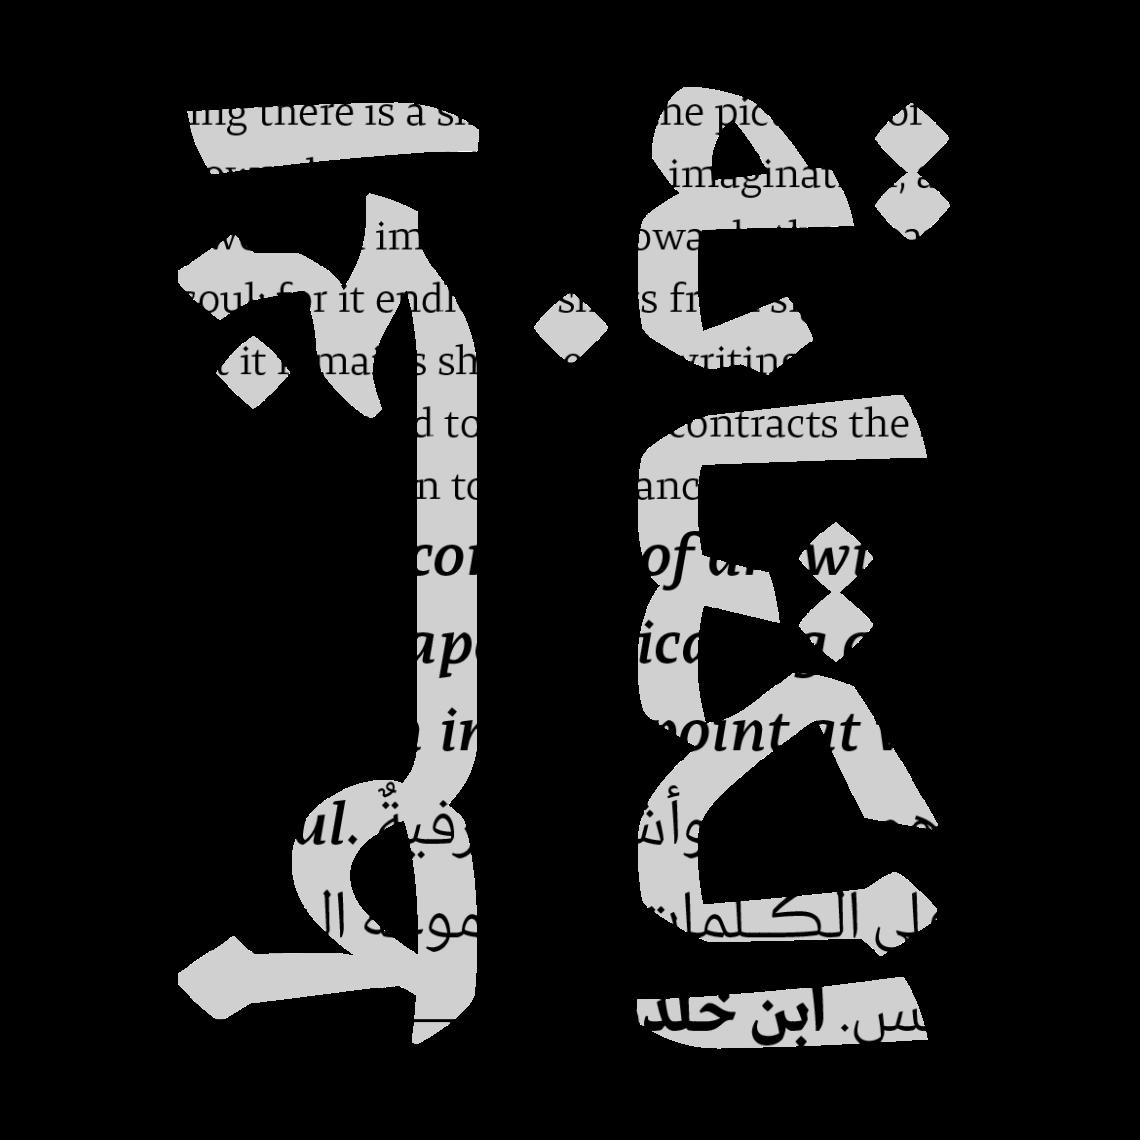 29LT-Zarid-Text-Image-13